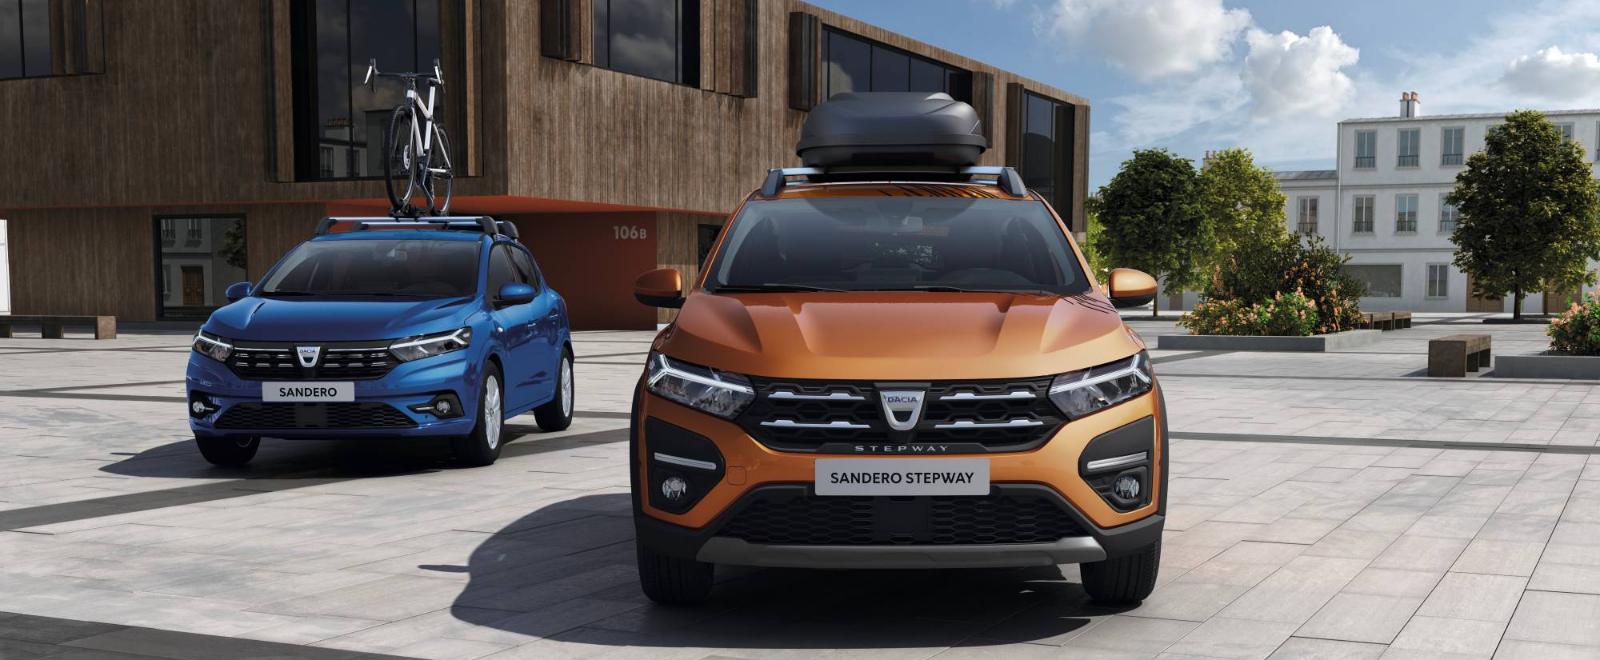 All-New Dacia Sandero: why a new platform?